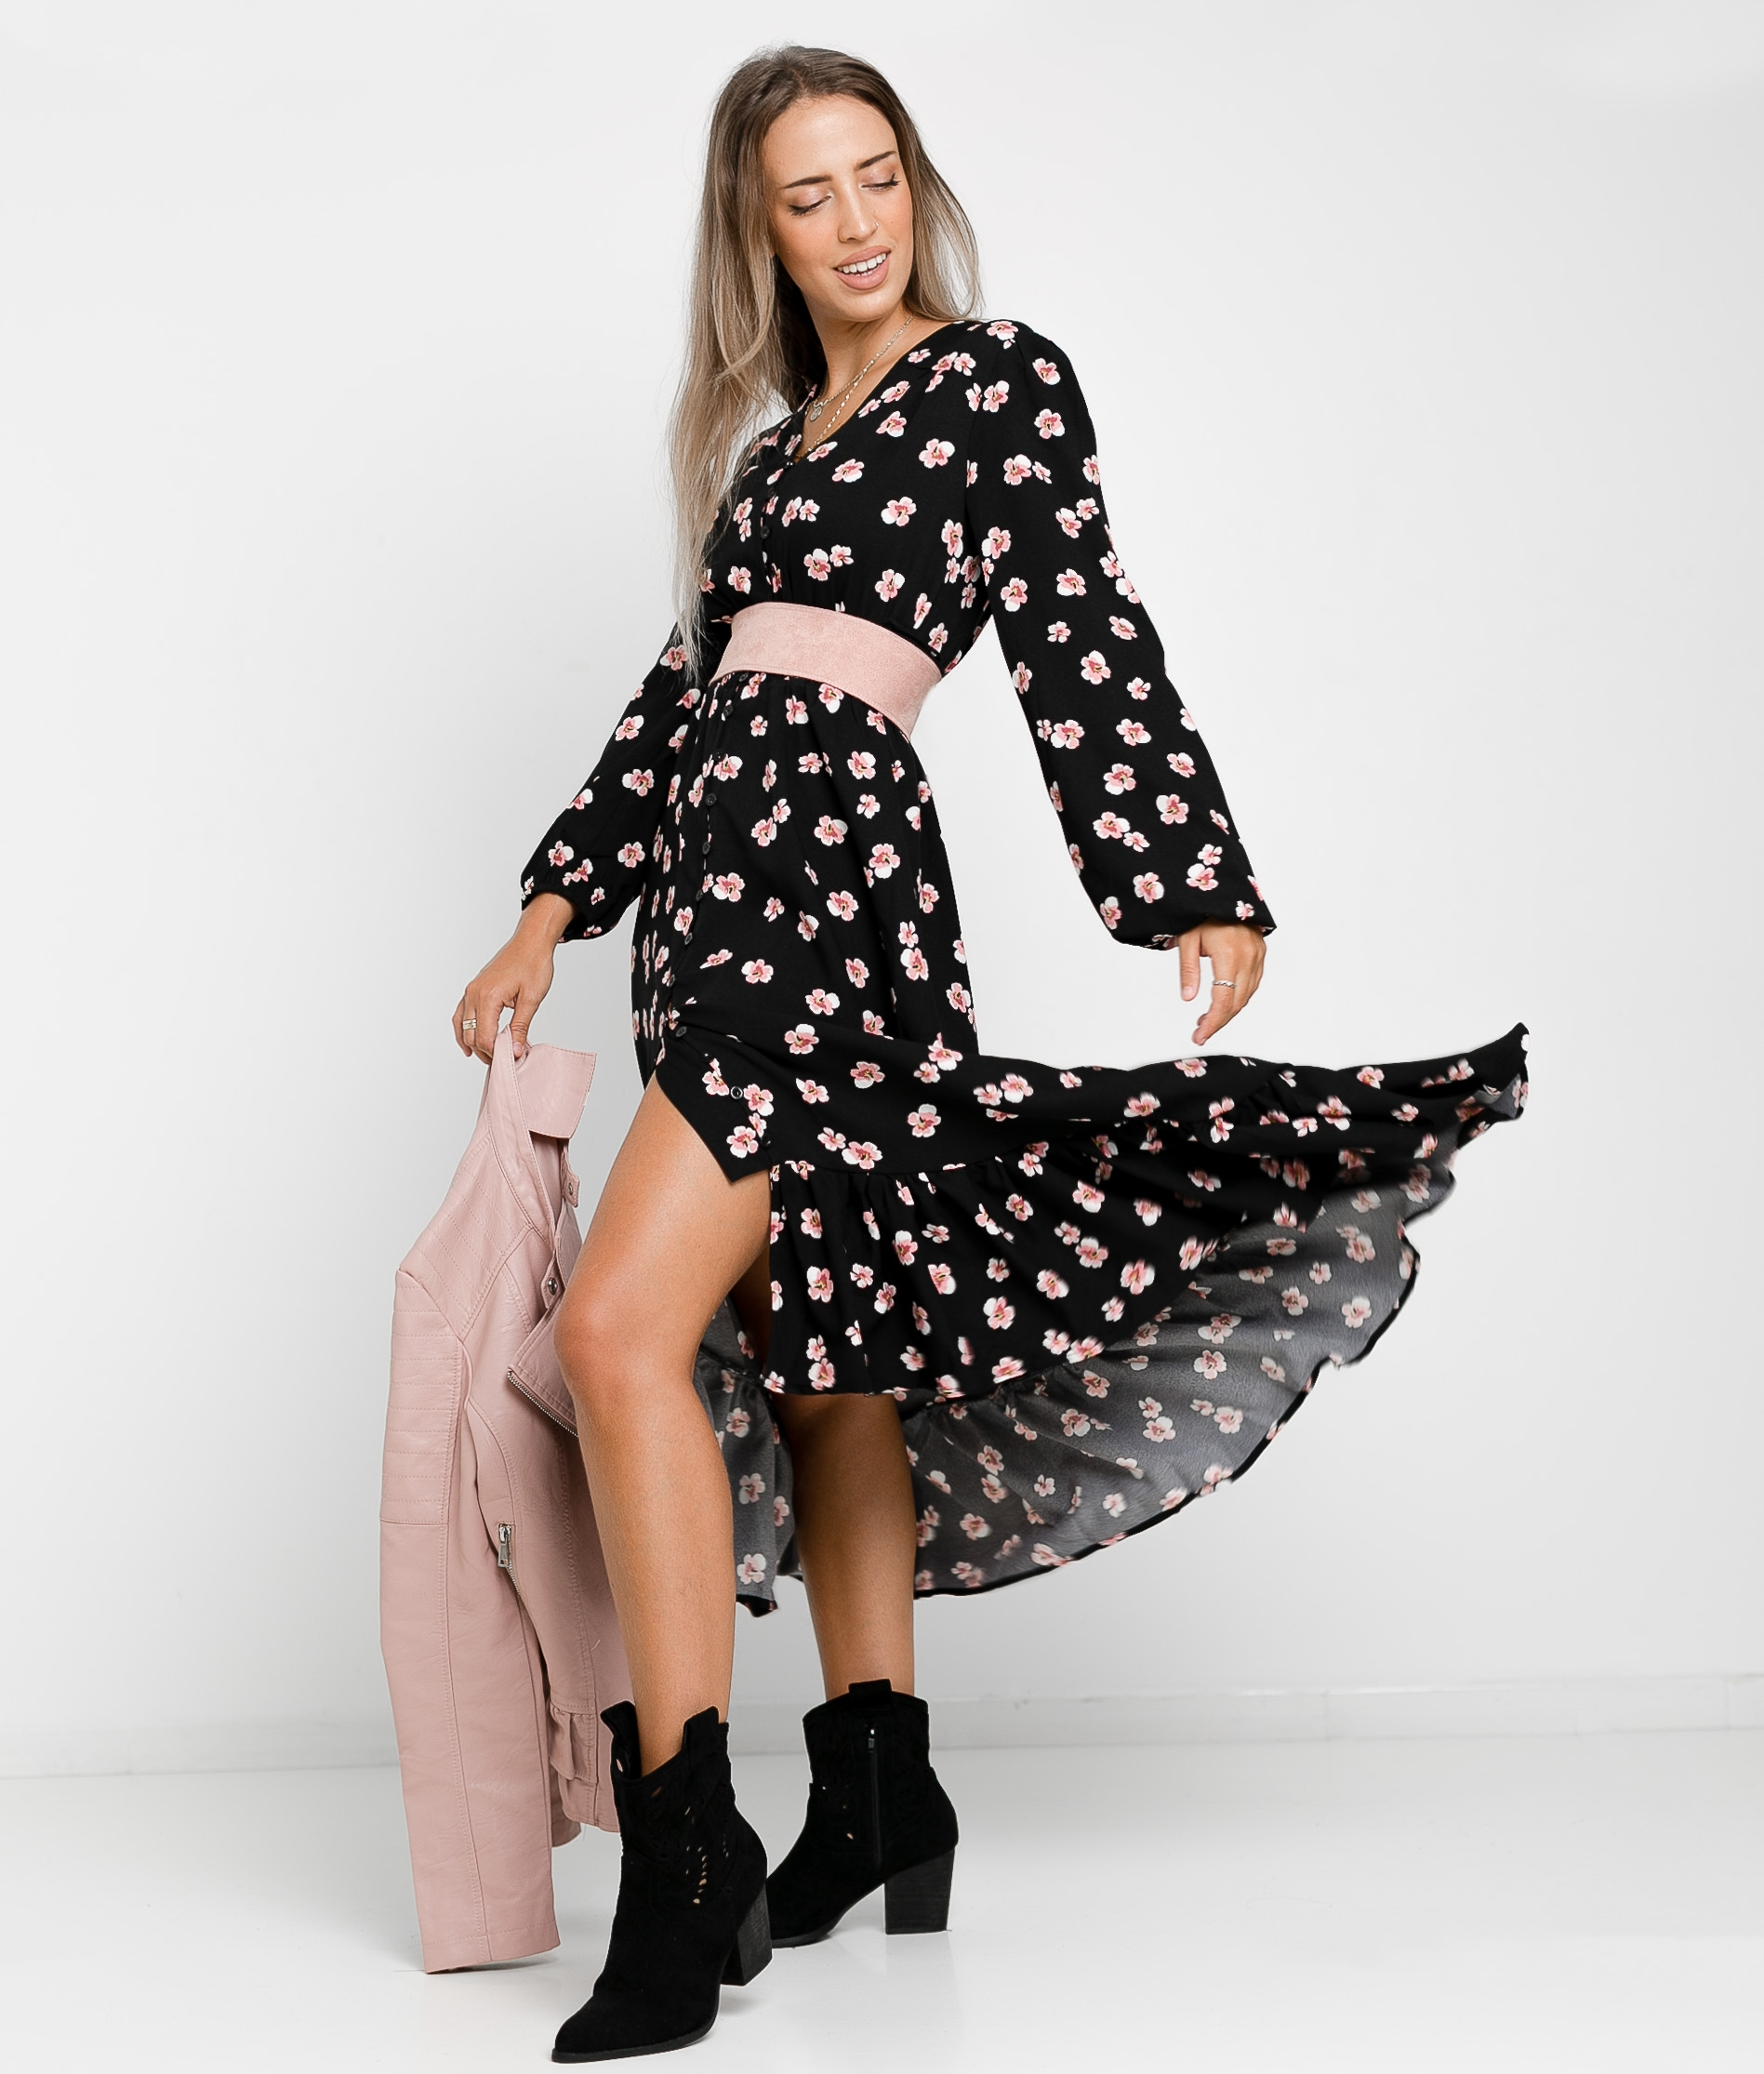 DRESS DESWI - BLACK